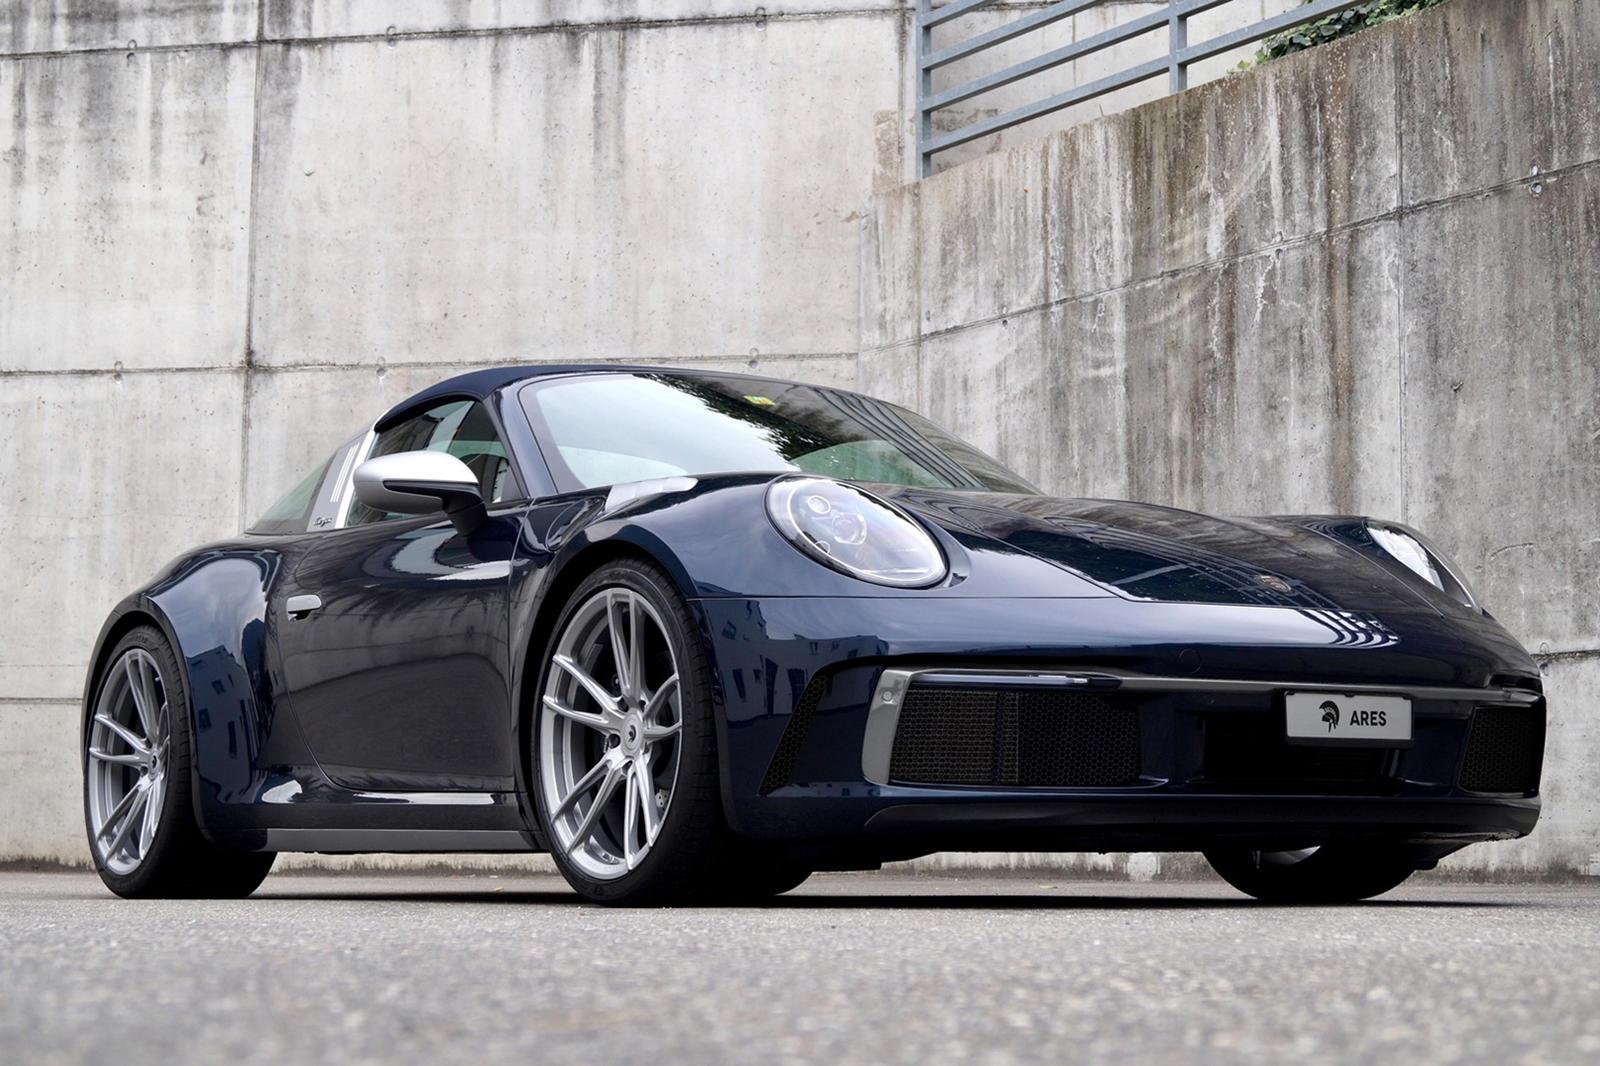 Porsche 911 Targa By Ares Design Is A One-Off Widebody Masterpiece